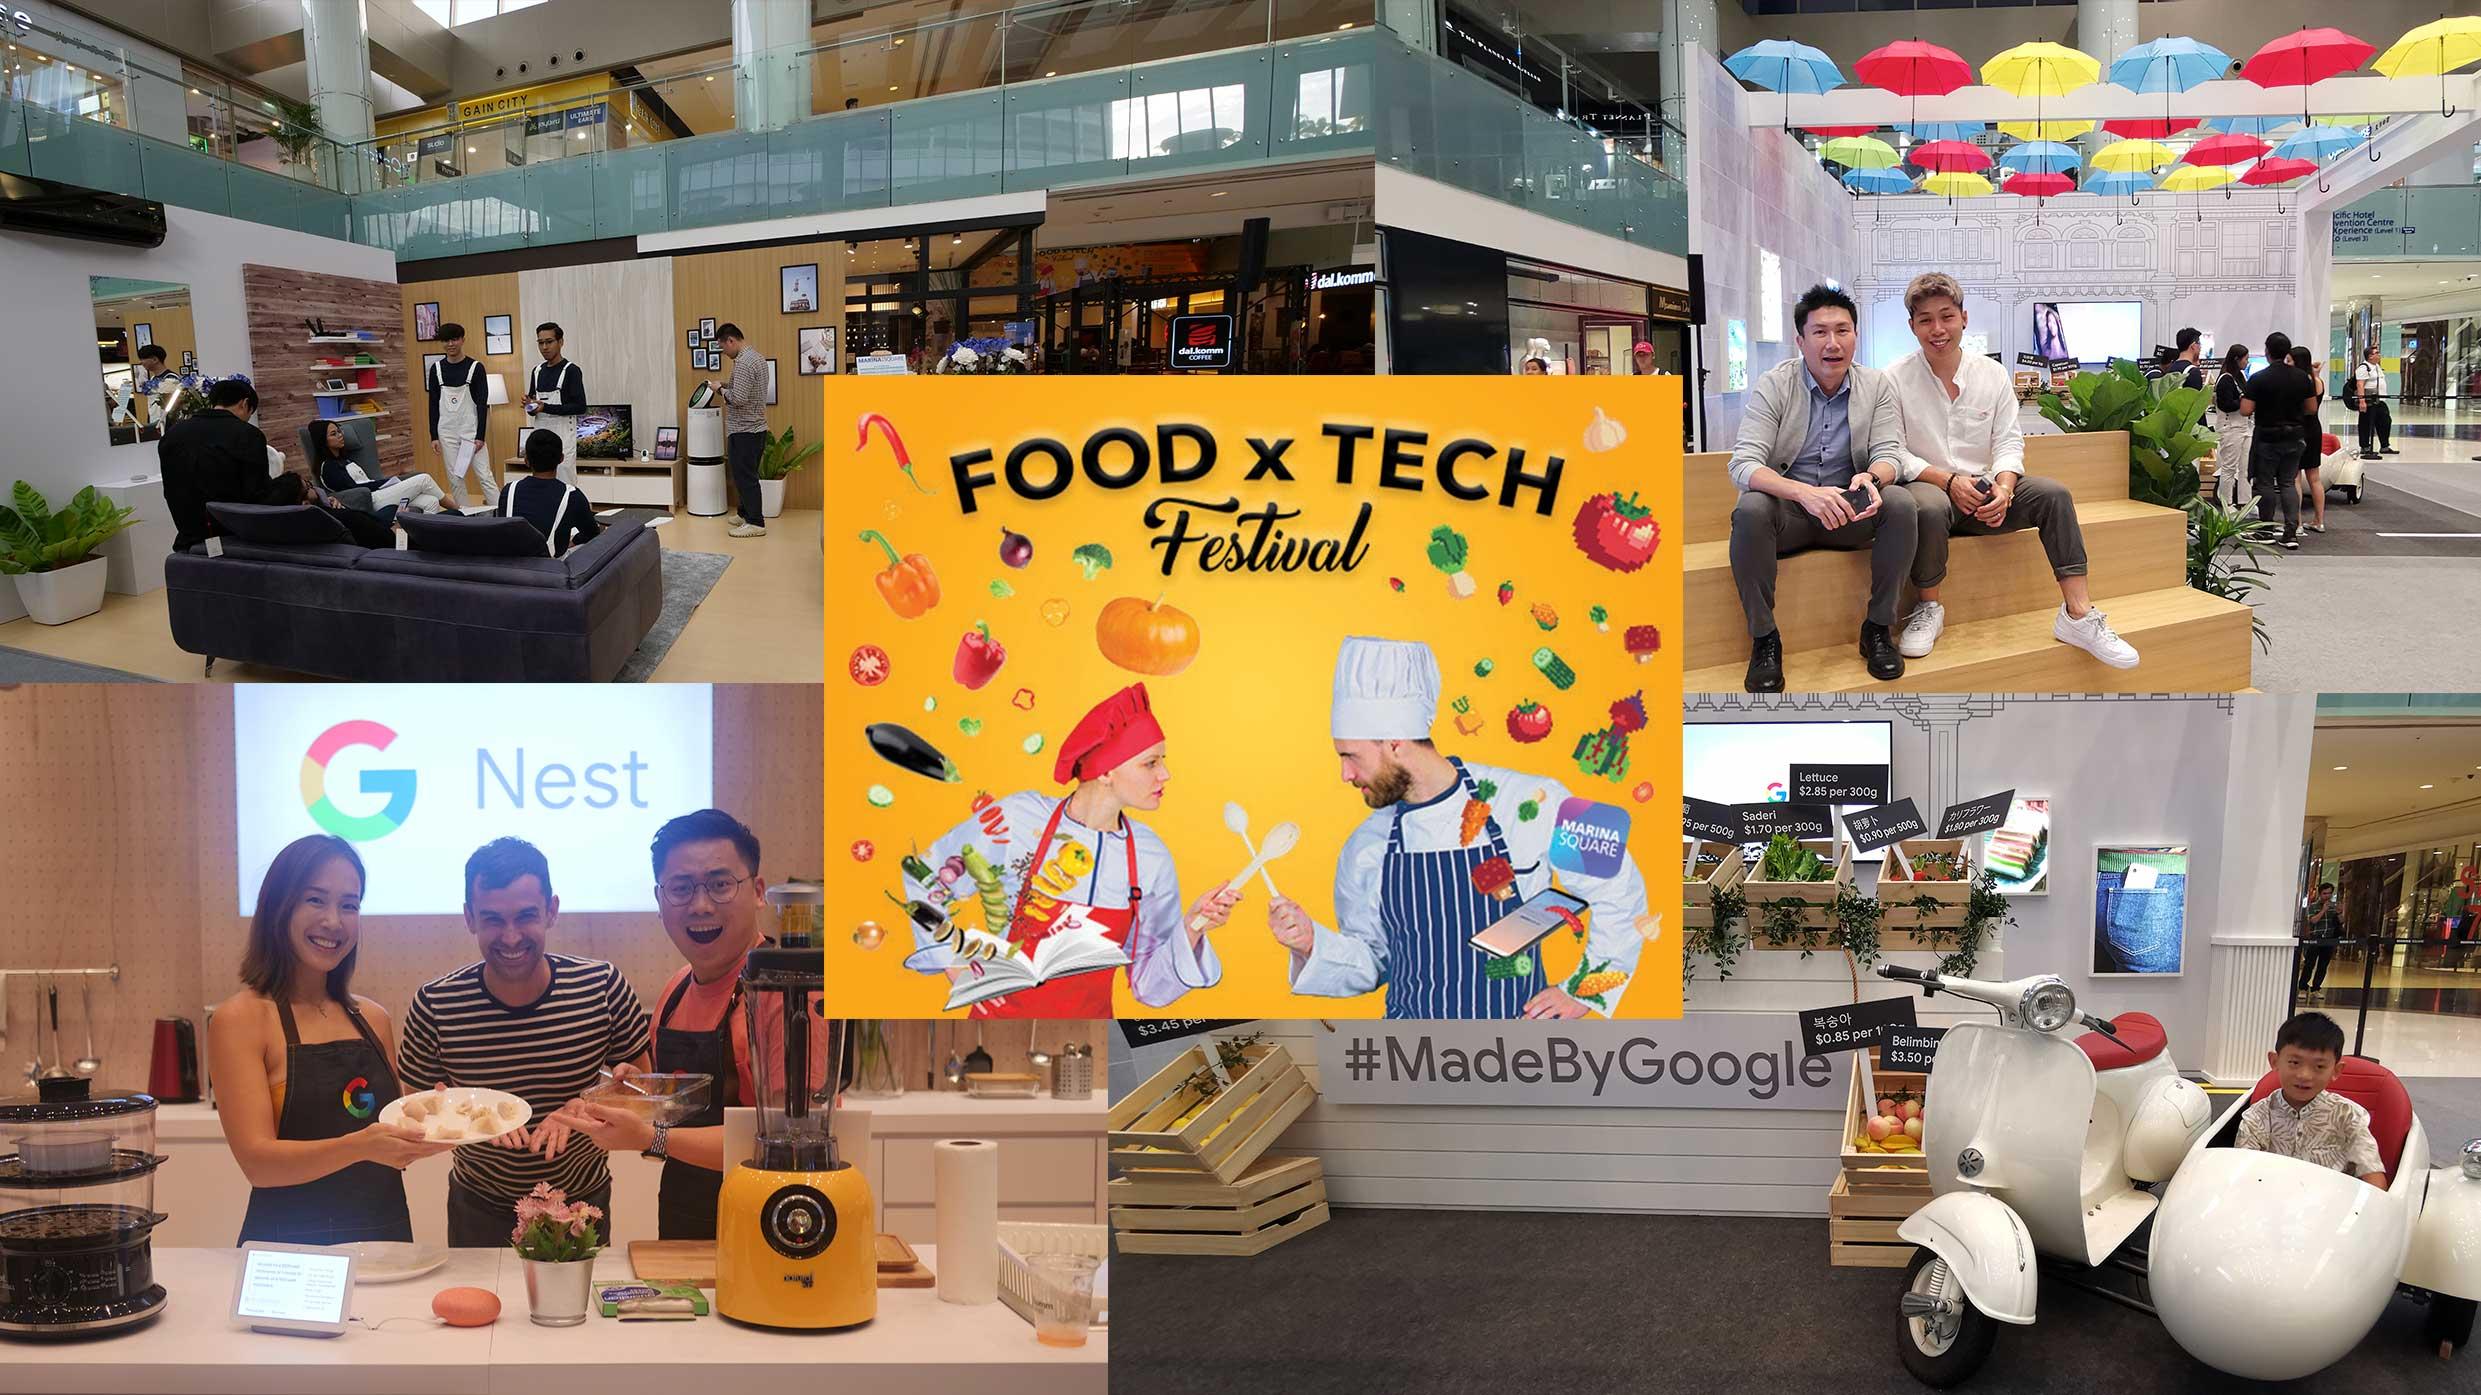 Experience Tony Stark's smart home at Marina Square's Food x Tech Festival with Google - Alvinology